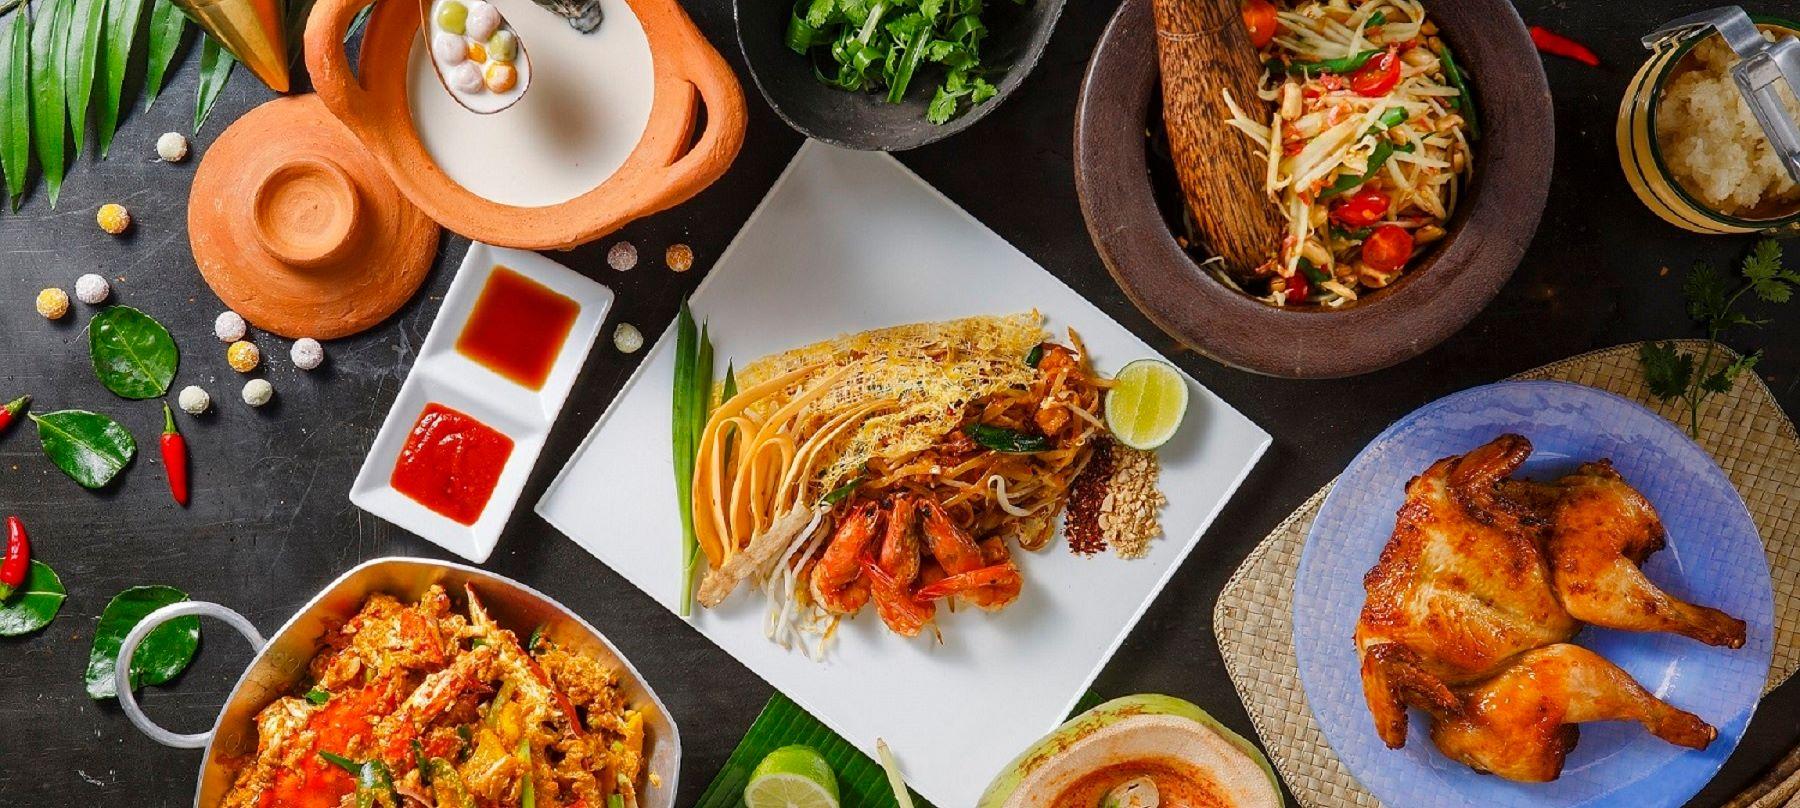 Thaifoodbuffet